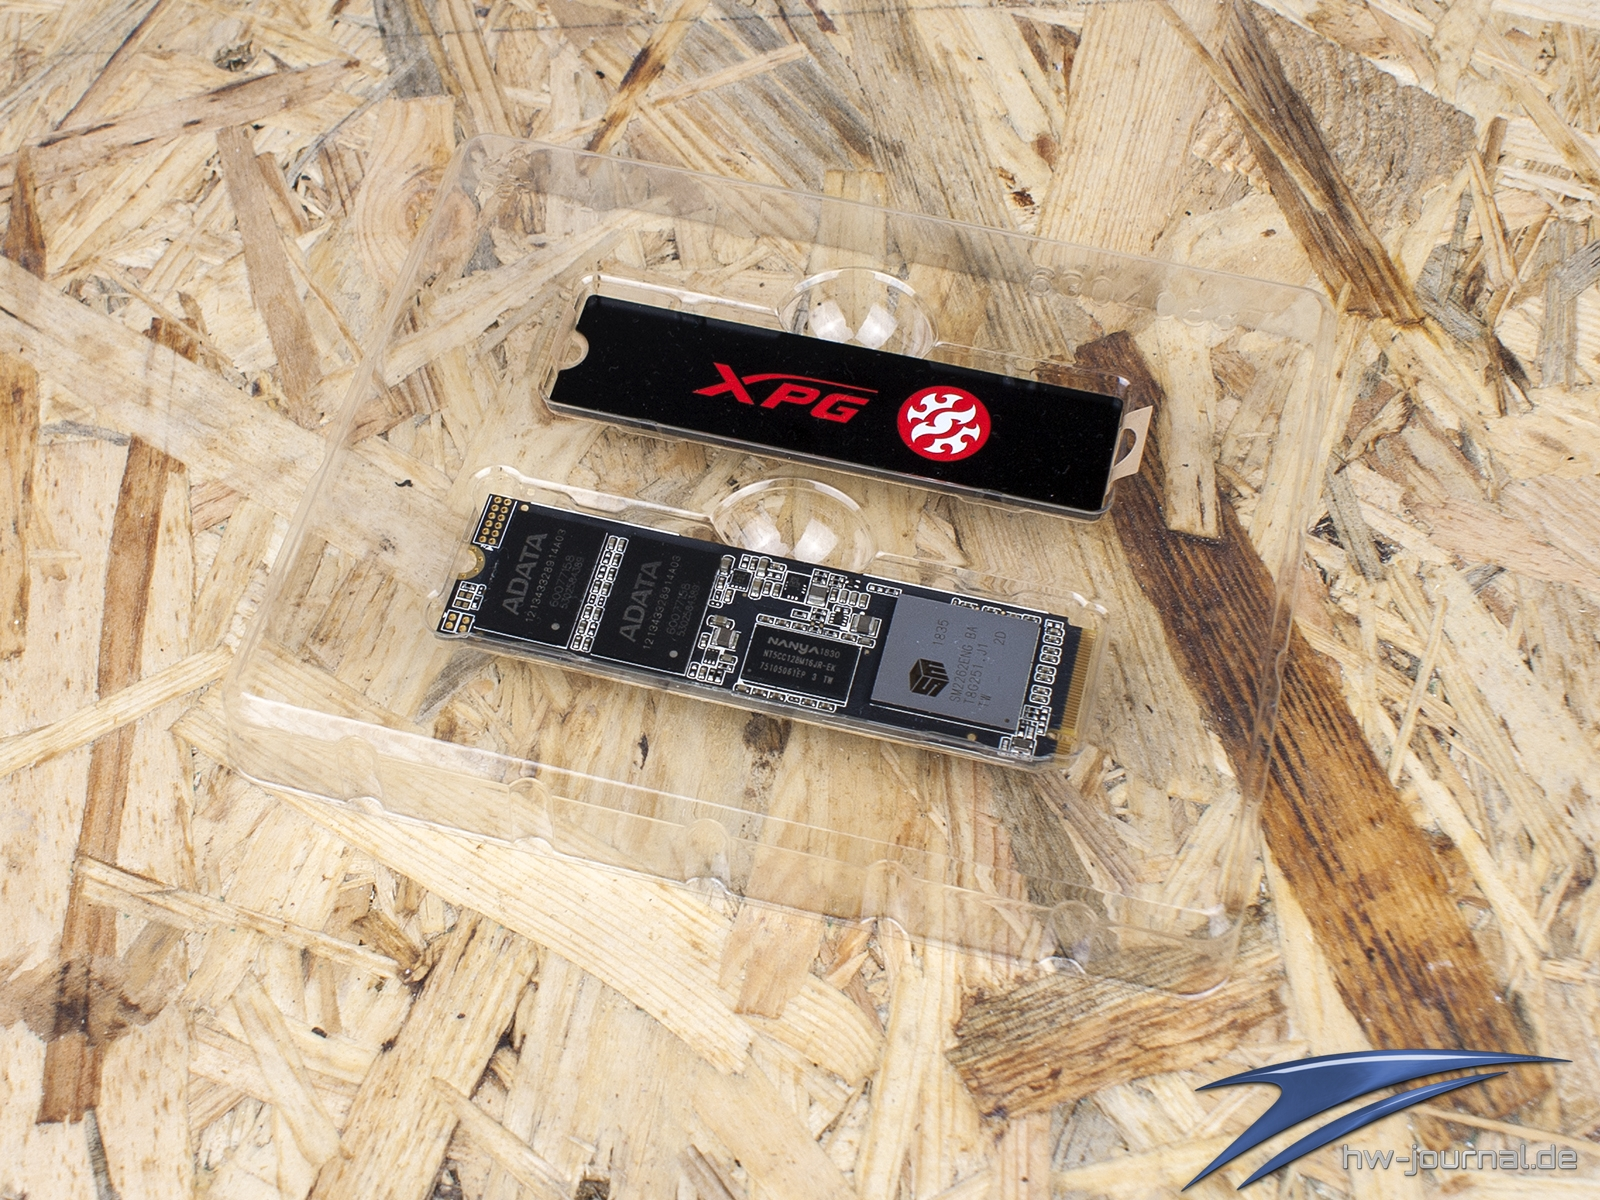 Test: ADATA XPG SX8200 Pro 512 GB - Hardware-Journal